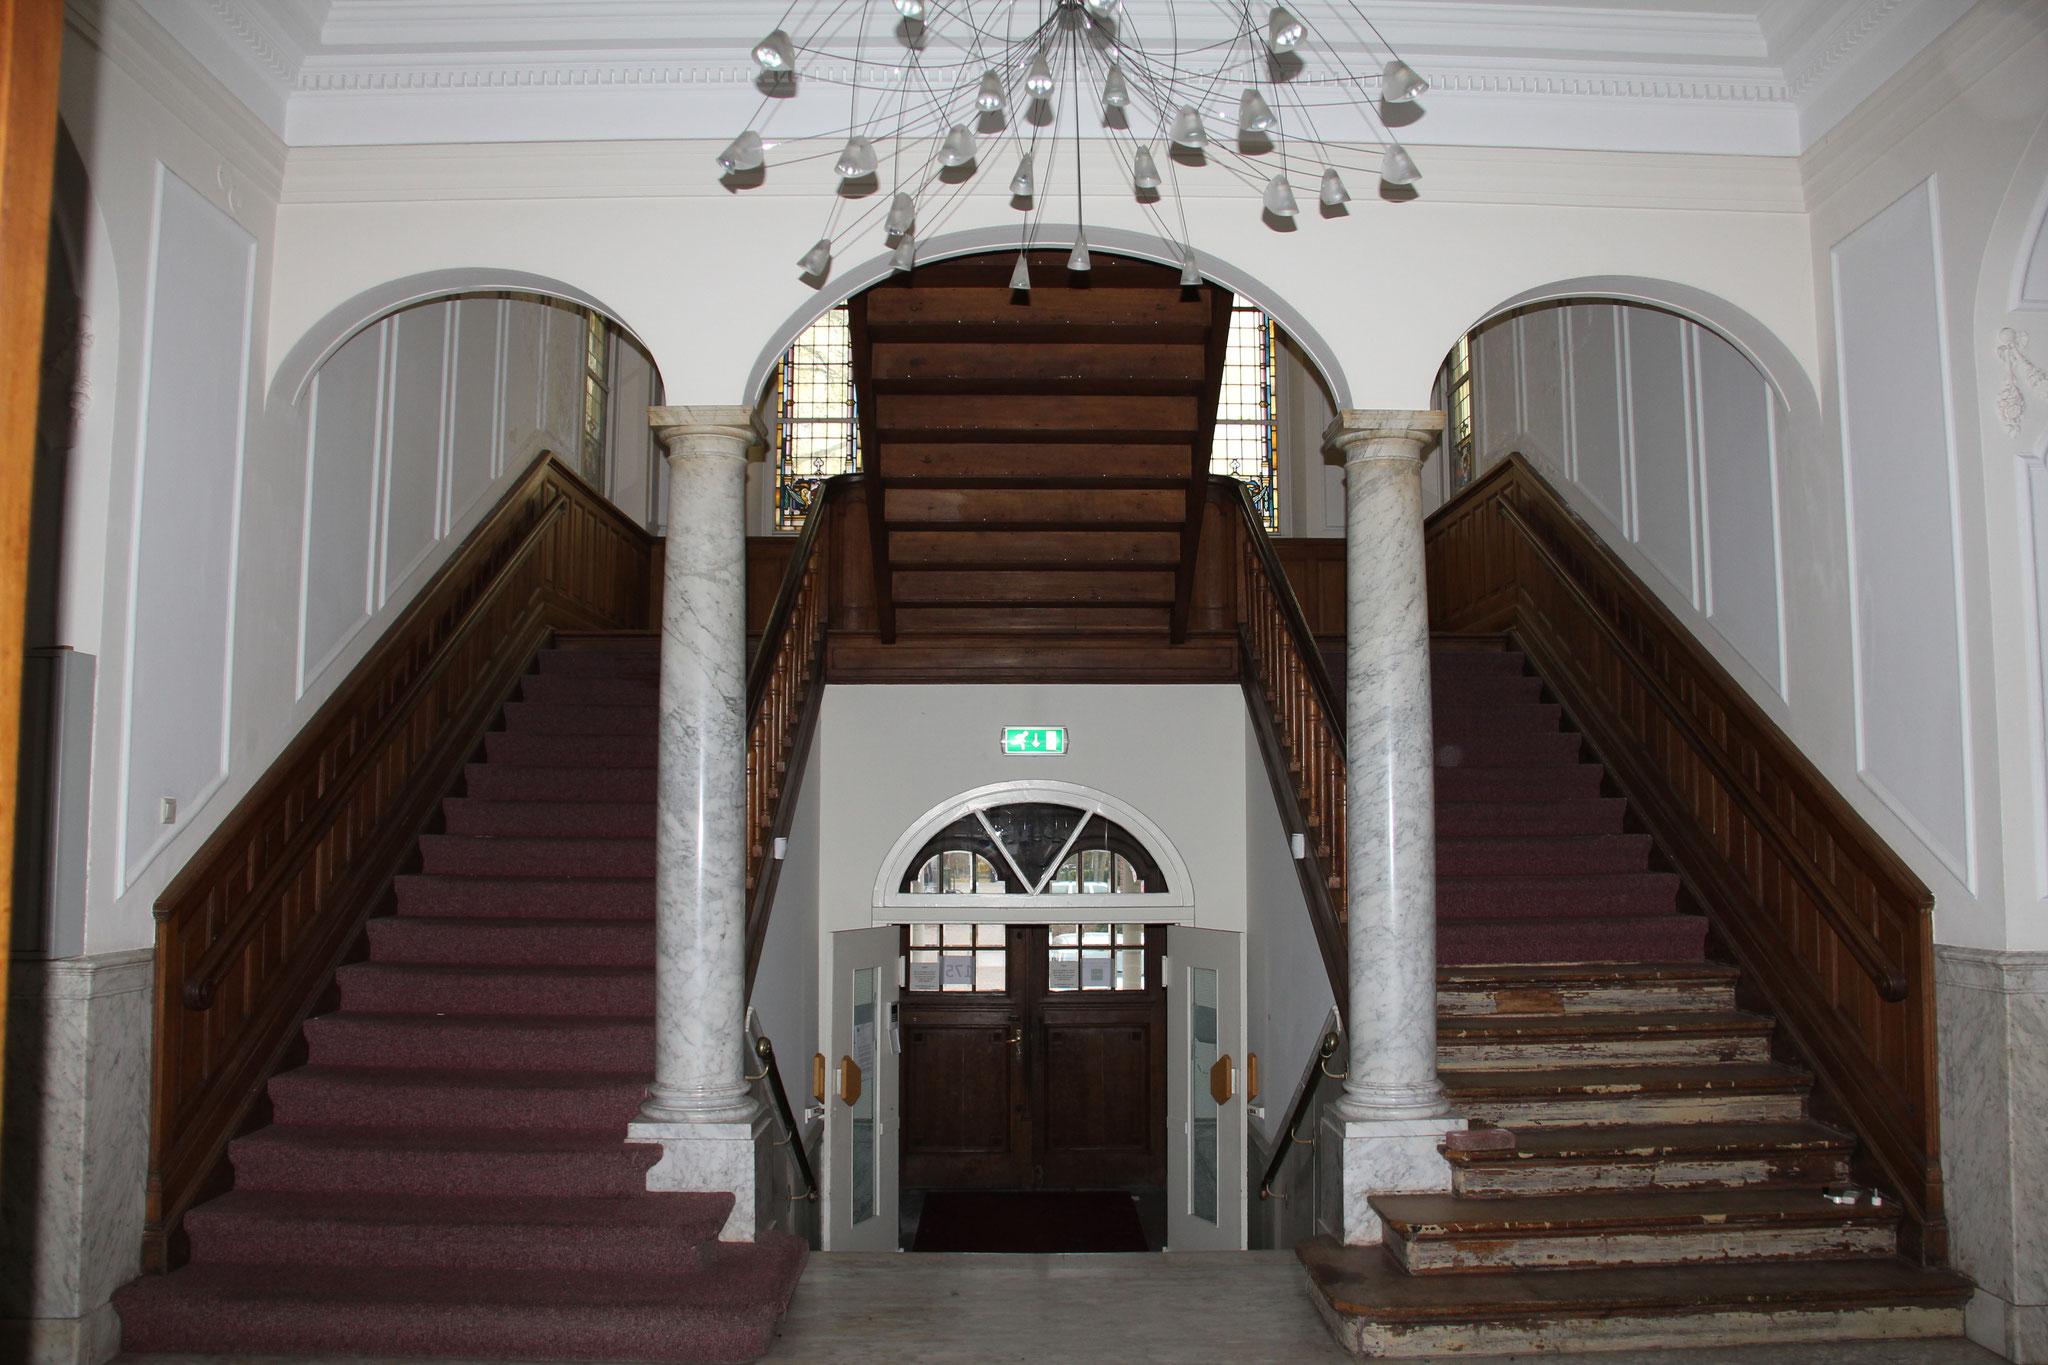 Trappenhuis van Veldheim met keizerstrap